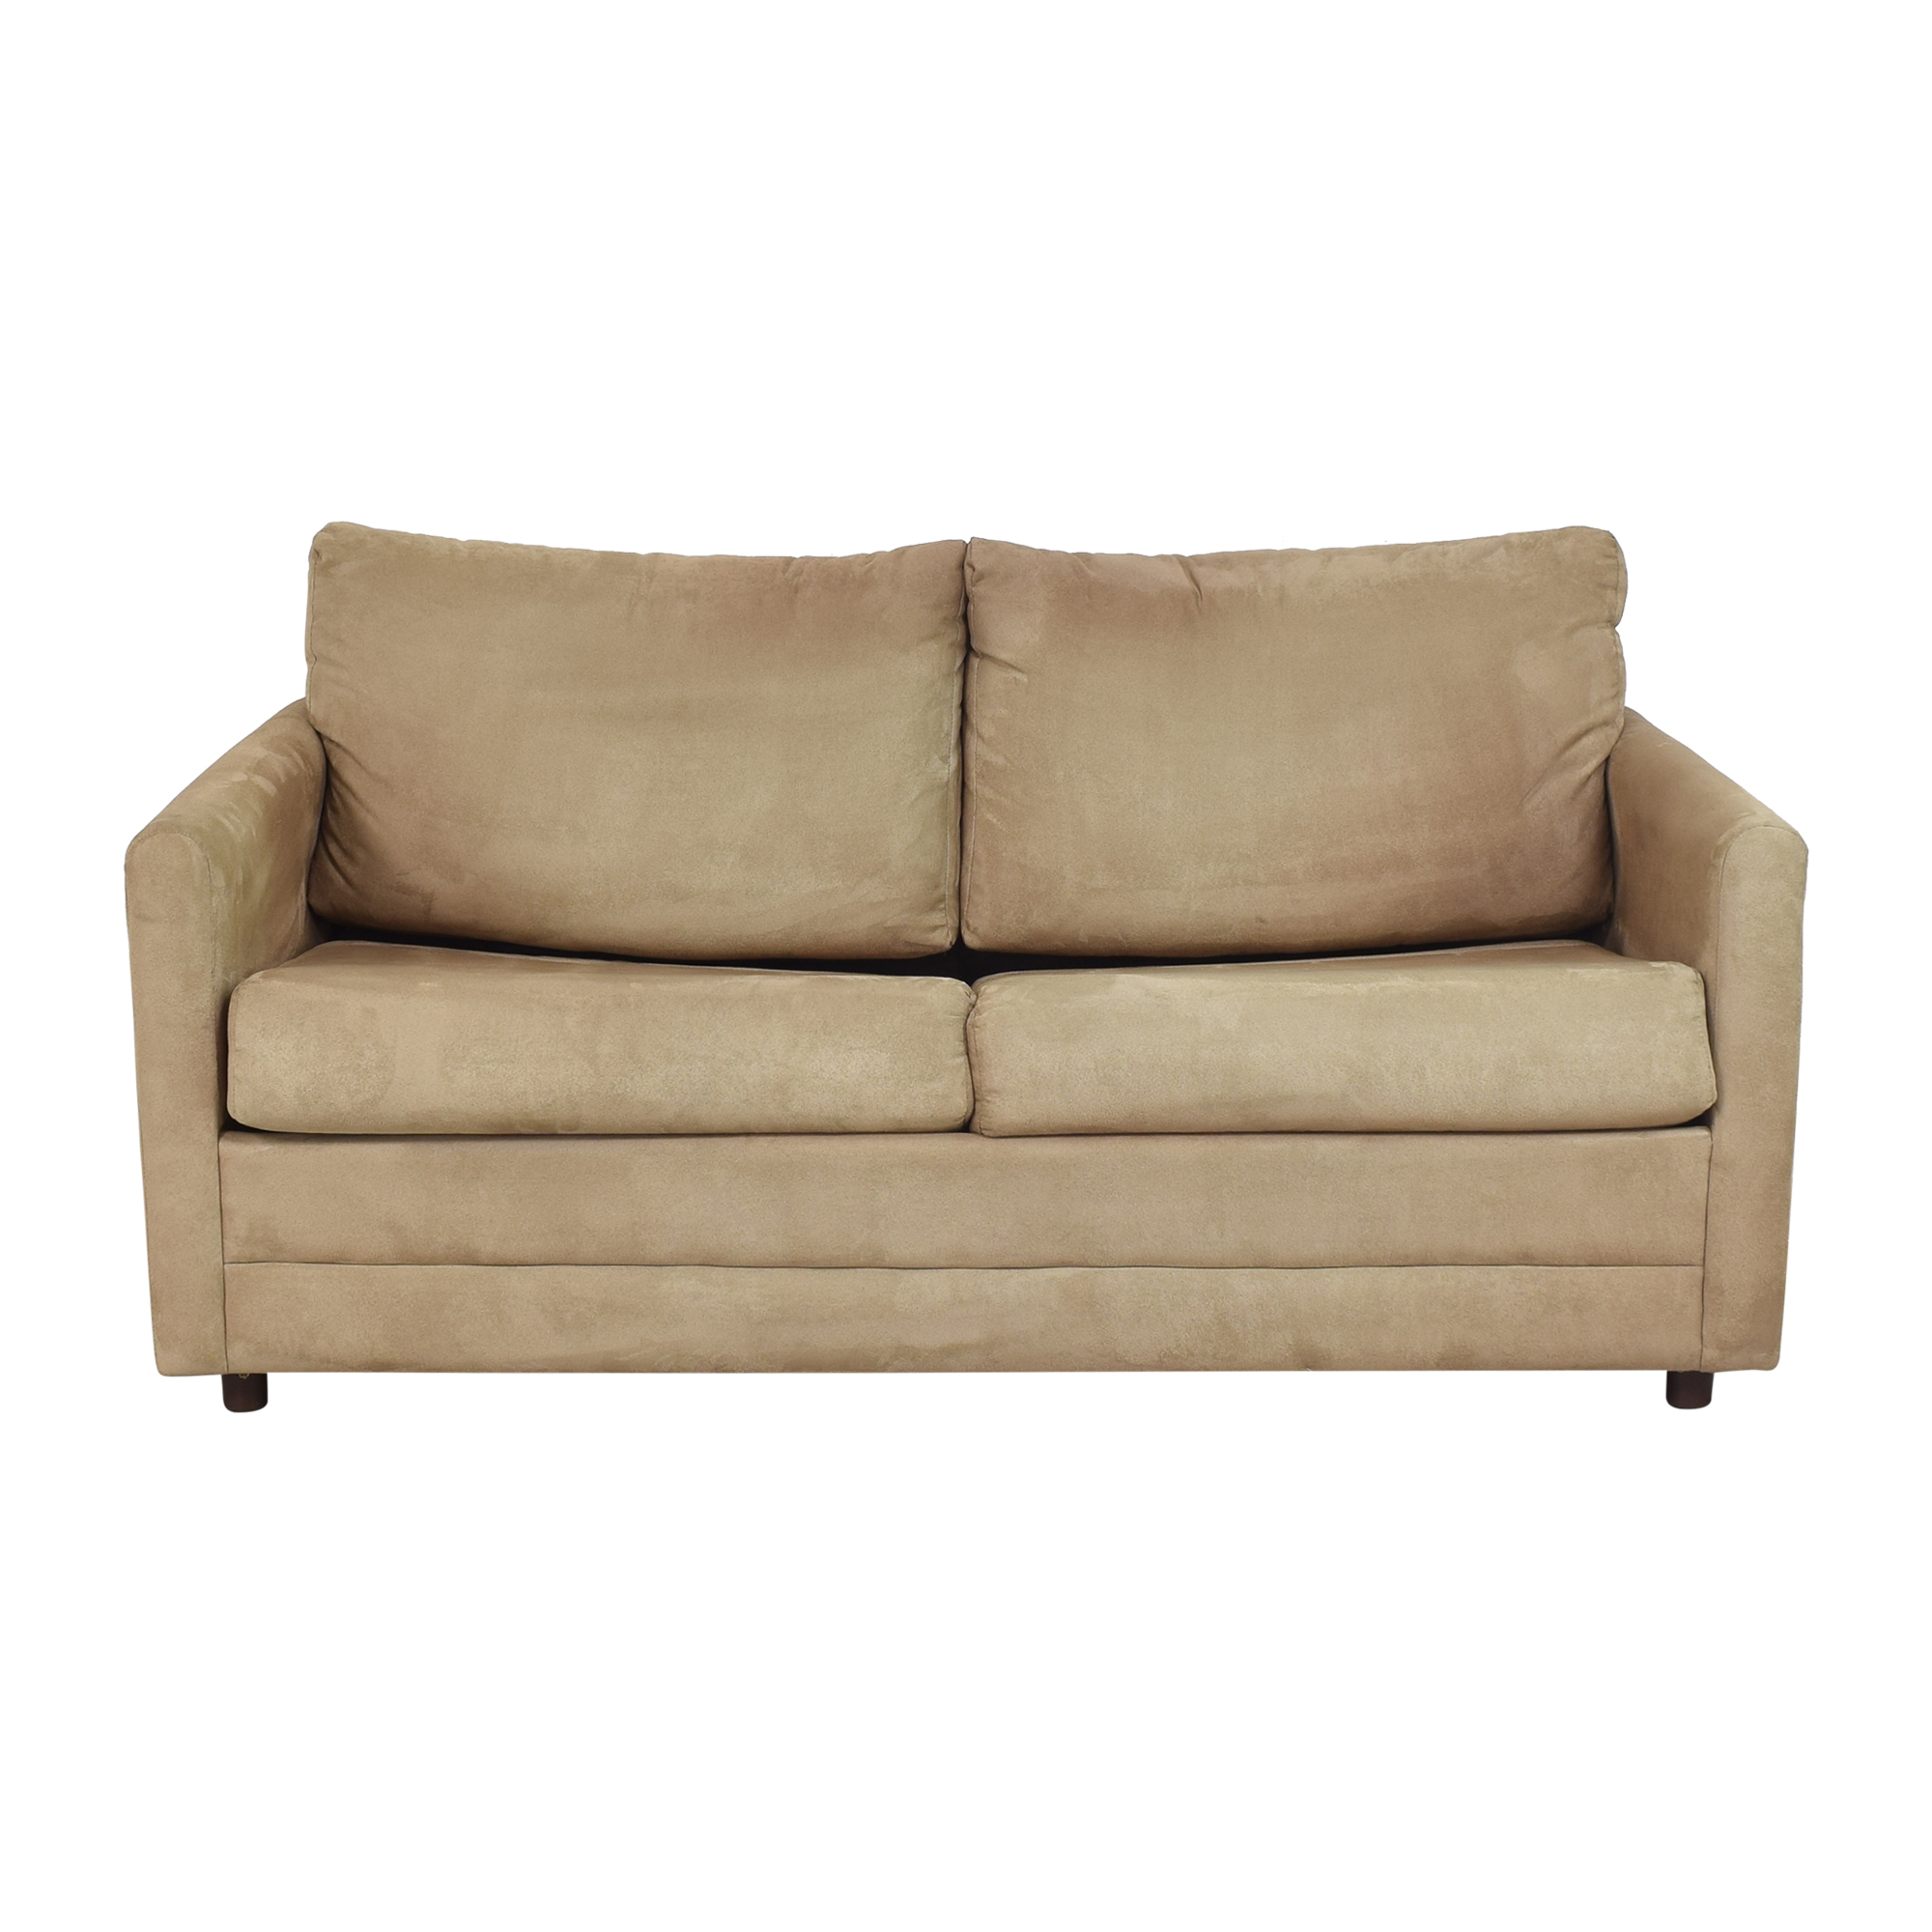 buy Lacrosse Furniture Two Cushion Sleeper Loveseat LaCrosse Furniture Sofas